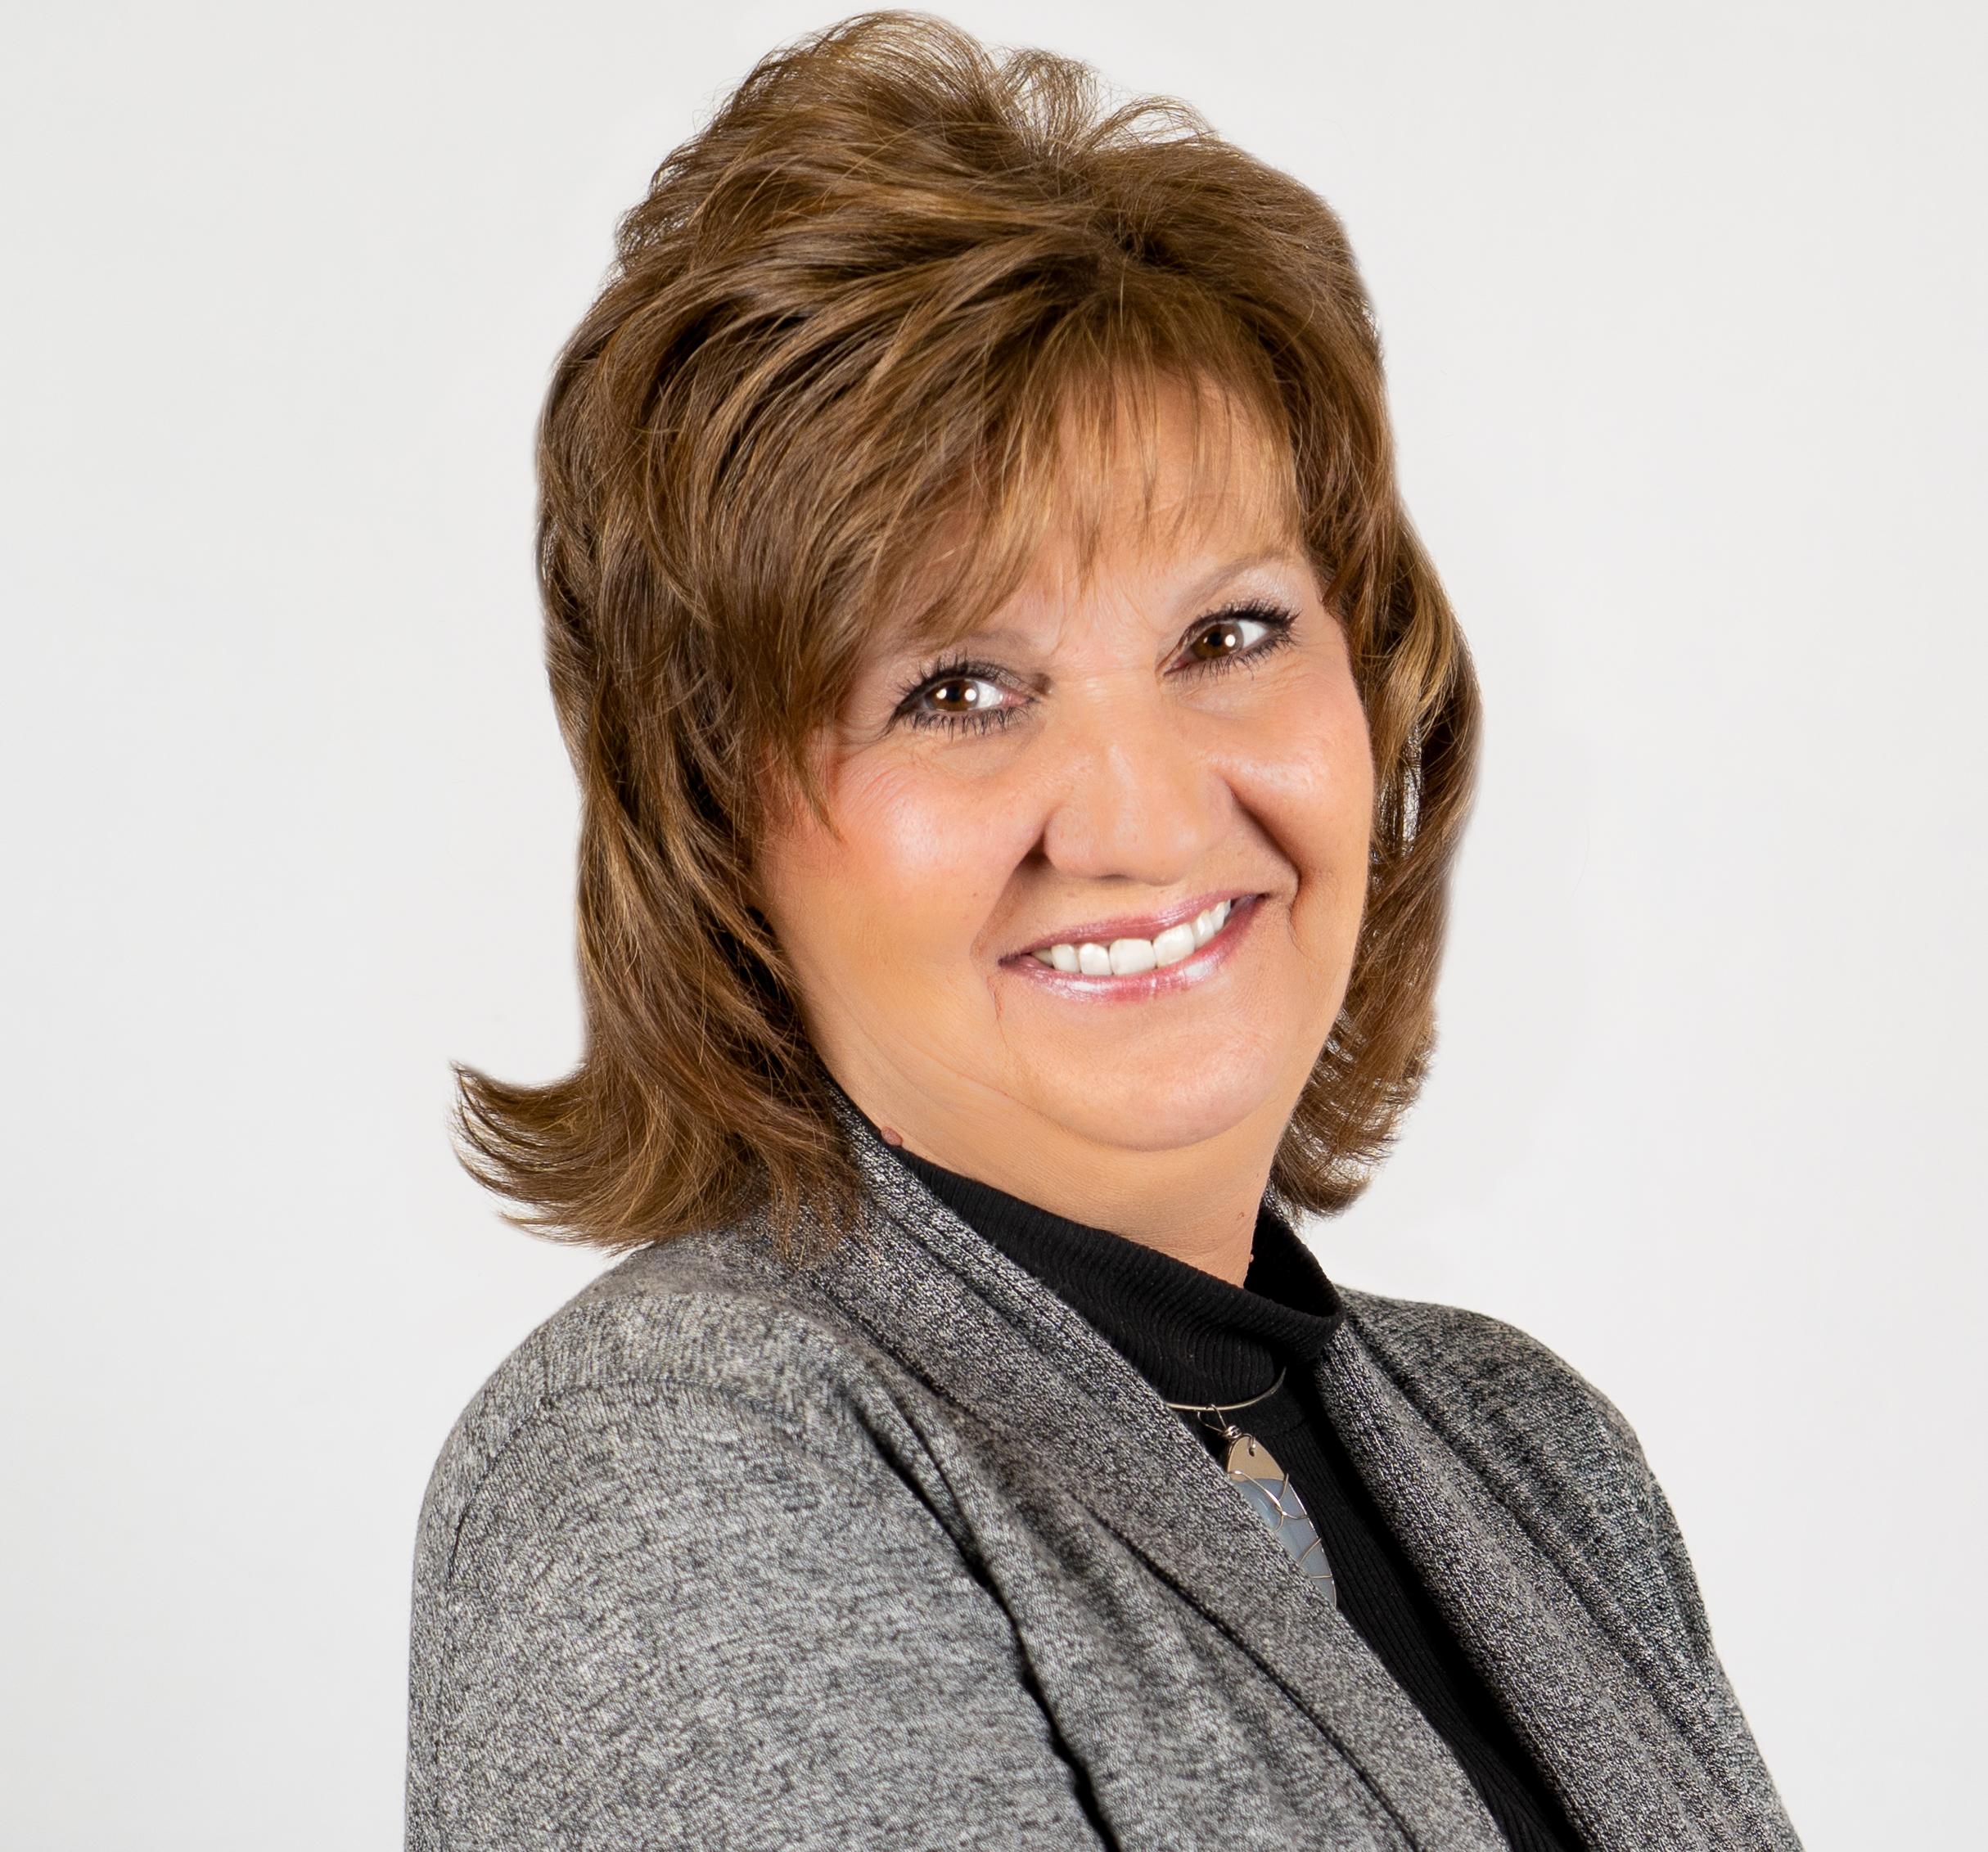 Kathy Glassburn